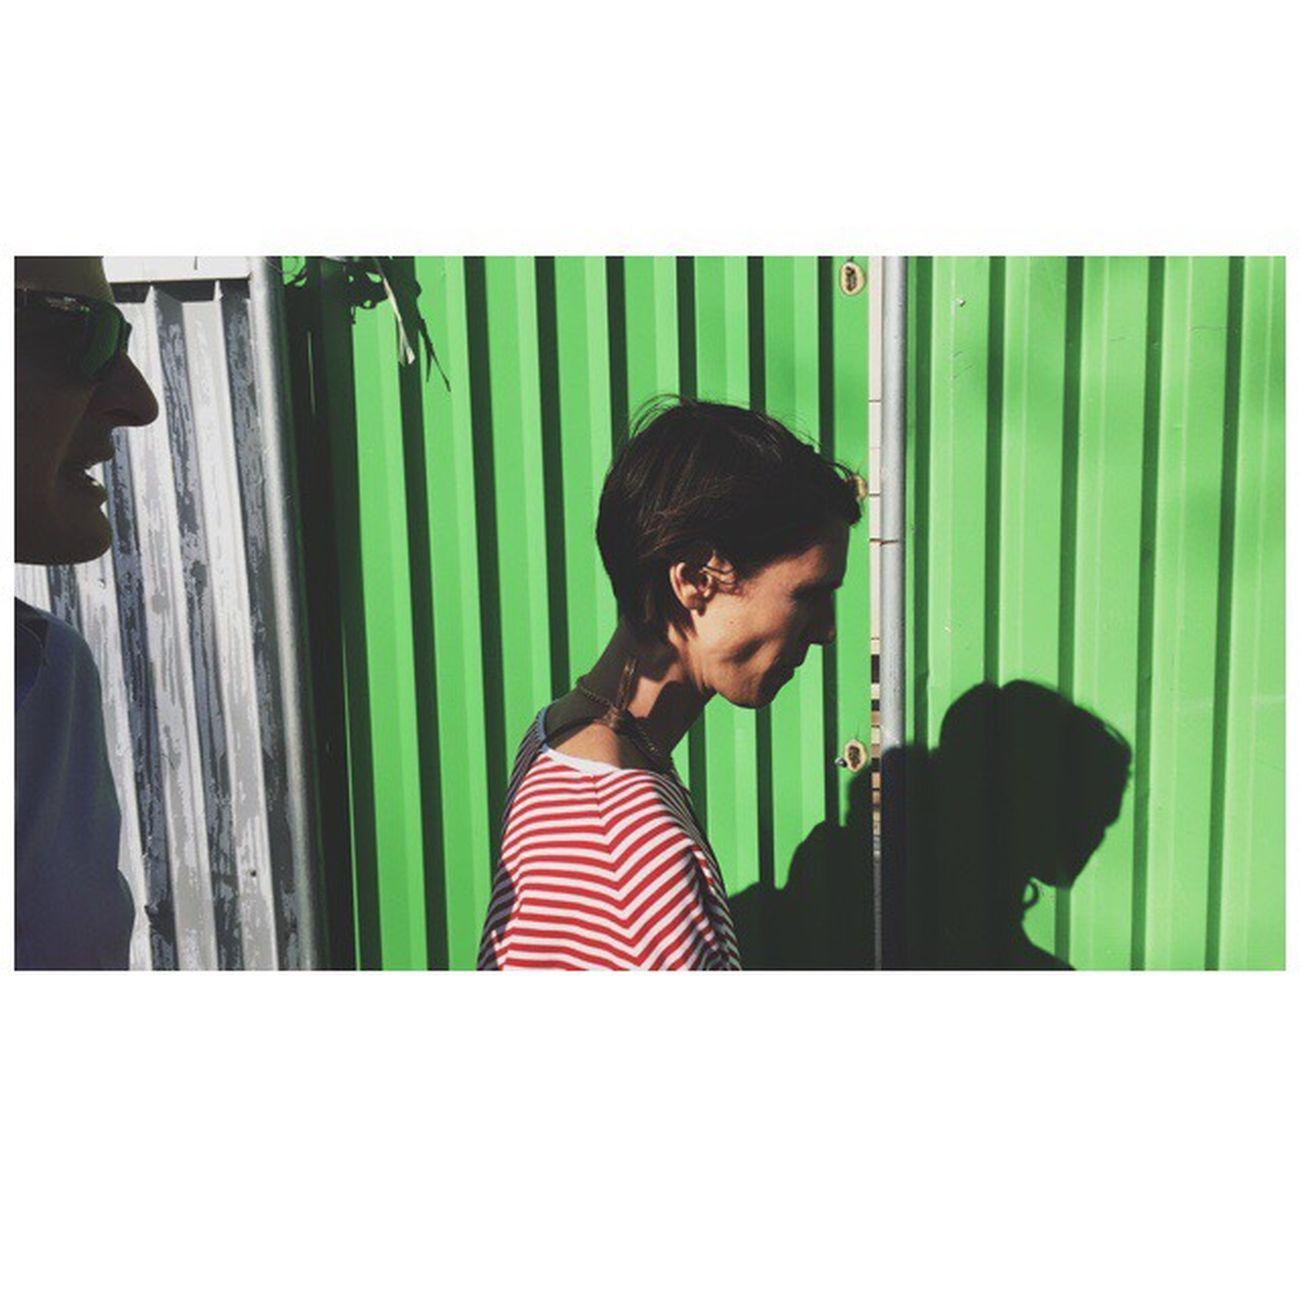 The SmART Gallery Mobilecameraclub Mobile Camera Club Street_photo_club Wearethestreet Parisian Connexion Everybodystreet Everybody Street EyeEm Best Shots City Street Lifestyles Parisian Smartphonephotography AMPt - Shoot Or Die Photo Of The Day Photo City Life Taking Photos Paris IPhoneography Streetphotography Color Streetcolor Streetcolour Streetphoto_color